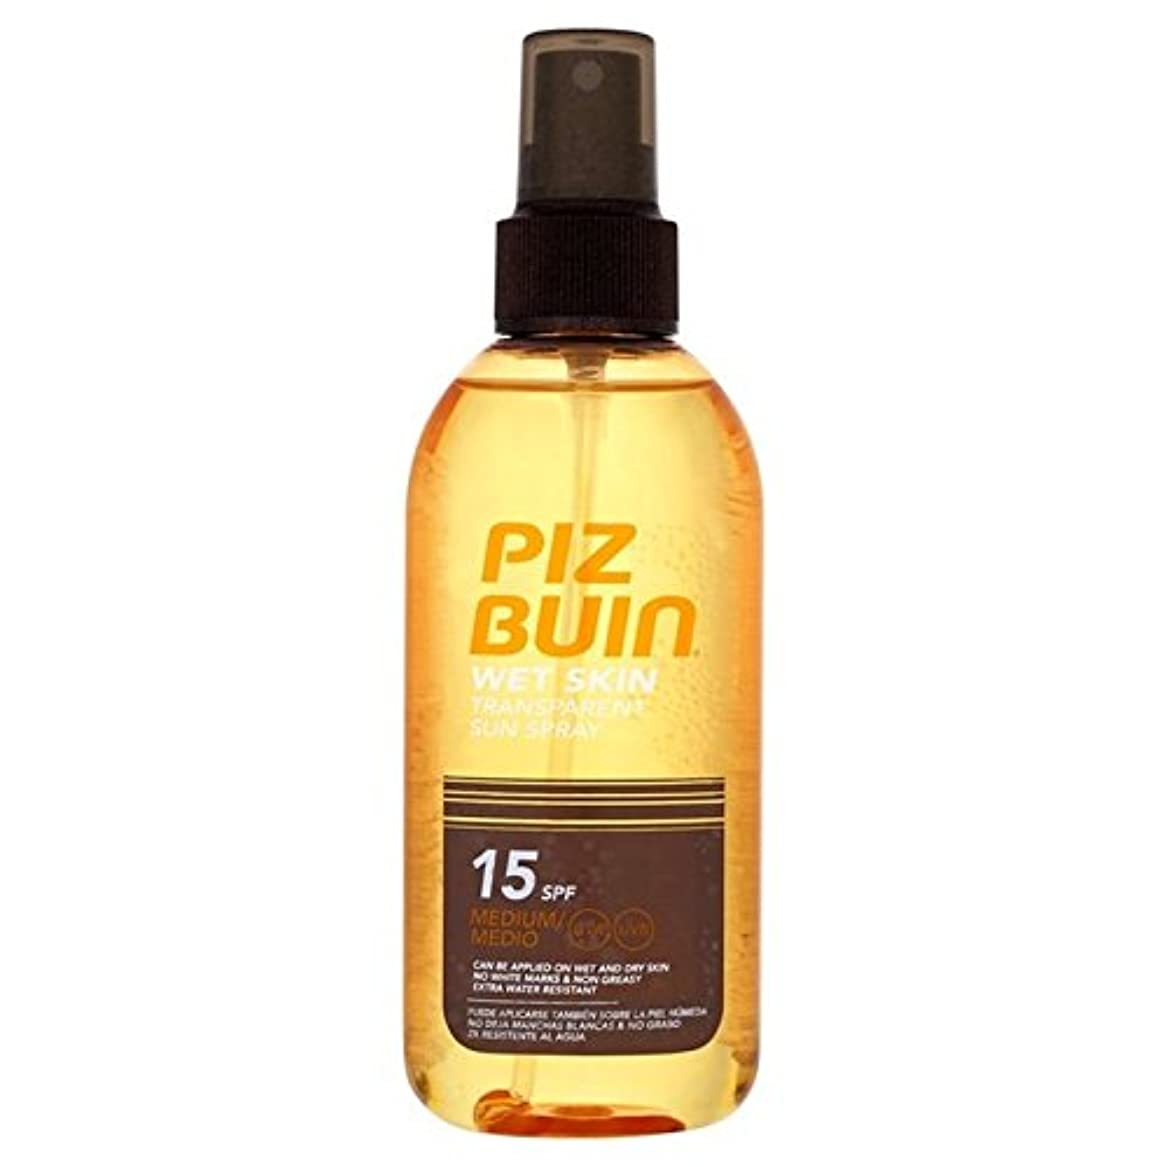 Piz Buin Wet Transparent Skin SPF15 150ml - ピッツブーインの湿った透明肌15の150ミリリットル [並行輸入品]